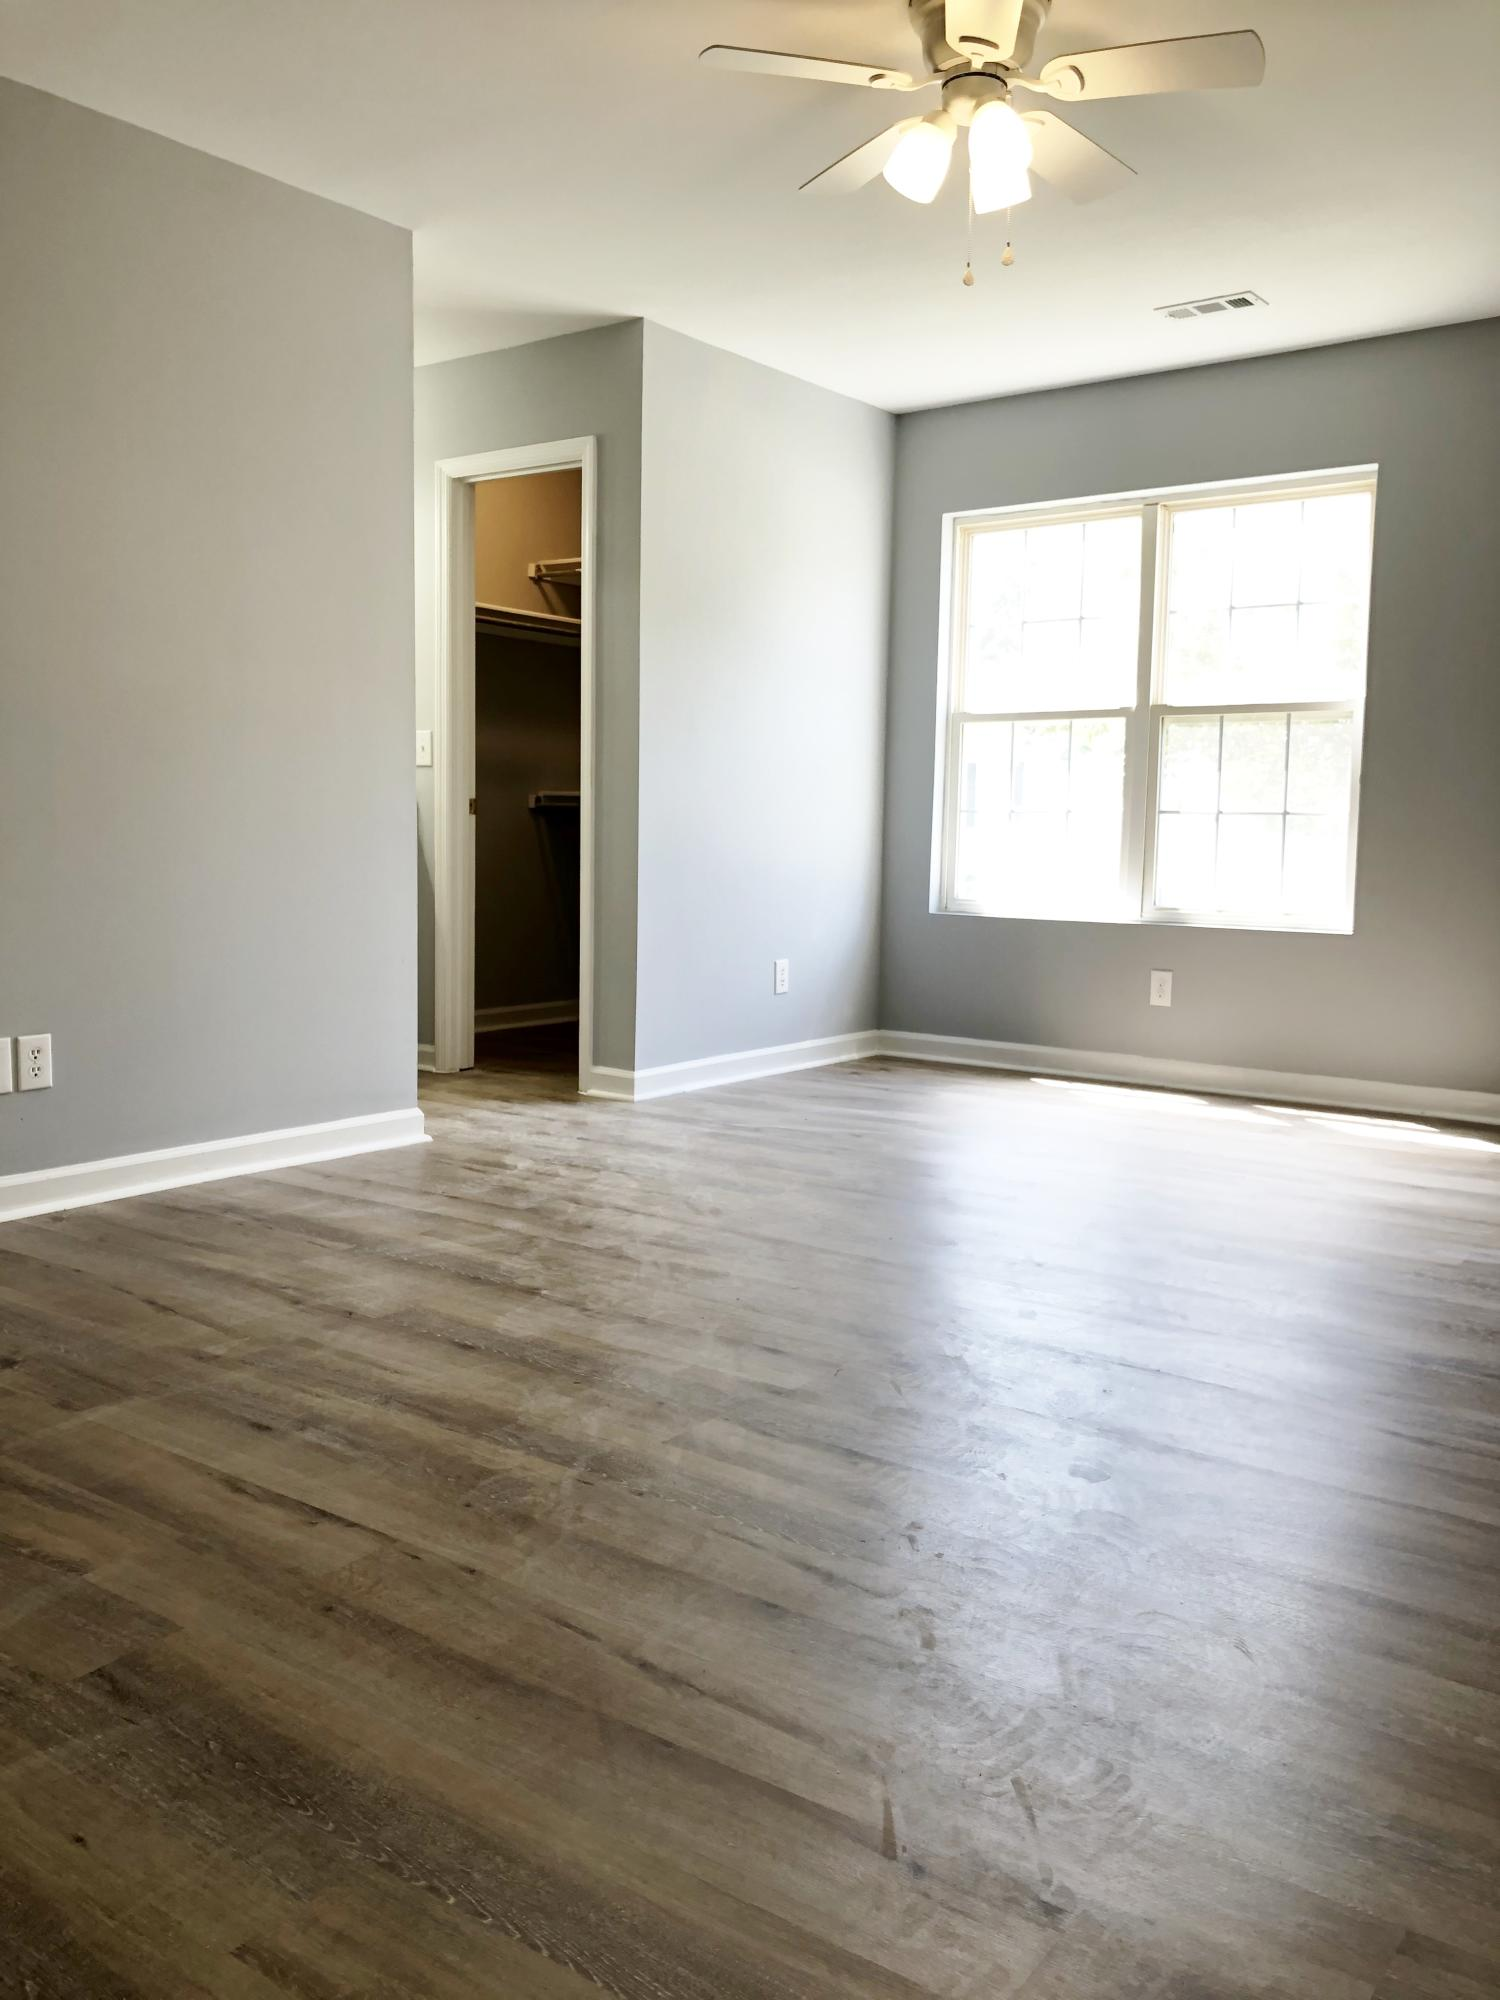 Plantation Point Homes For Sale - 6656 Bent Creek, North Charleston, SC - 20